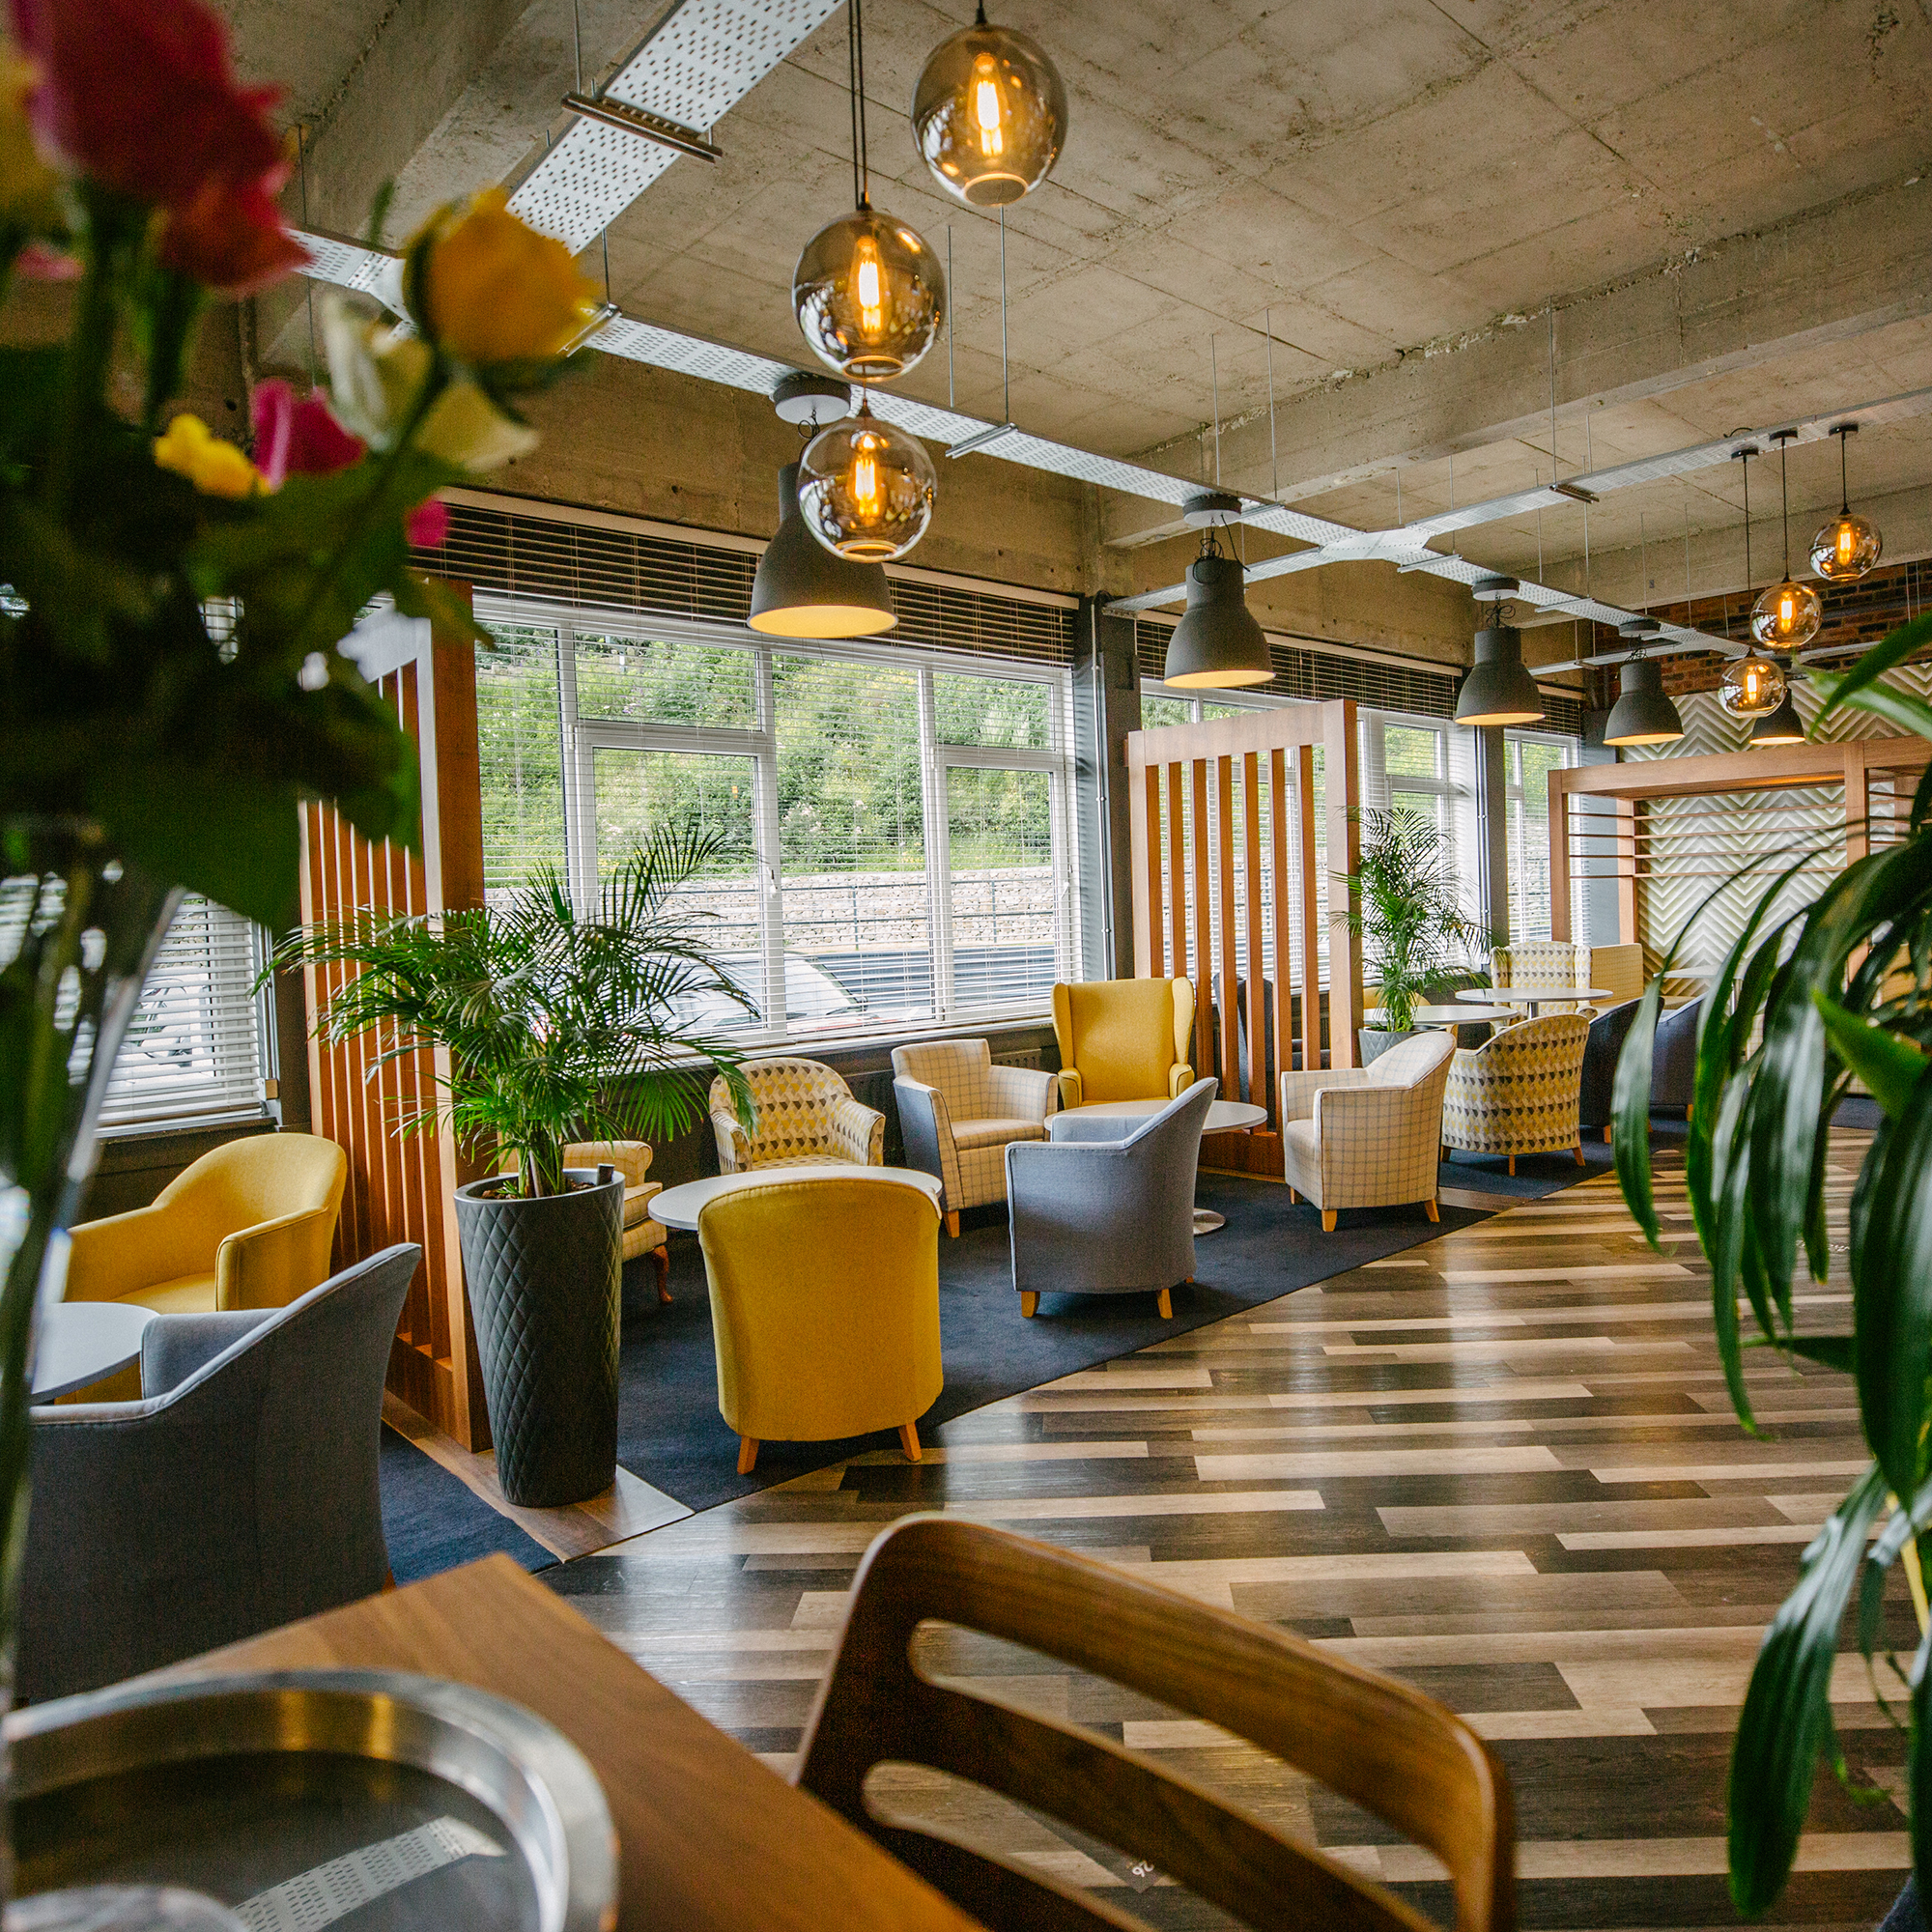 hub26 club26 free 1 day trial lounge